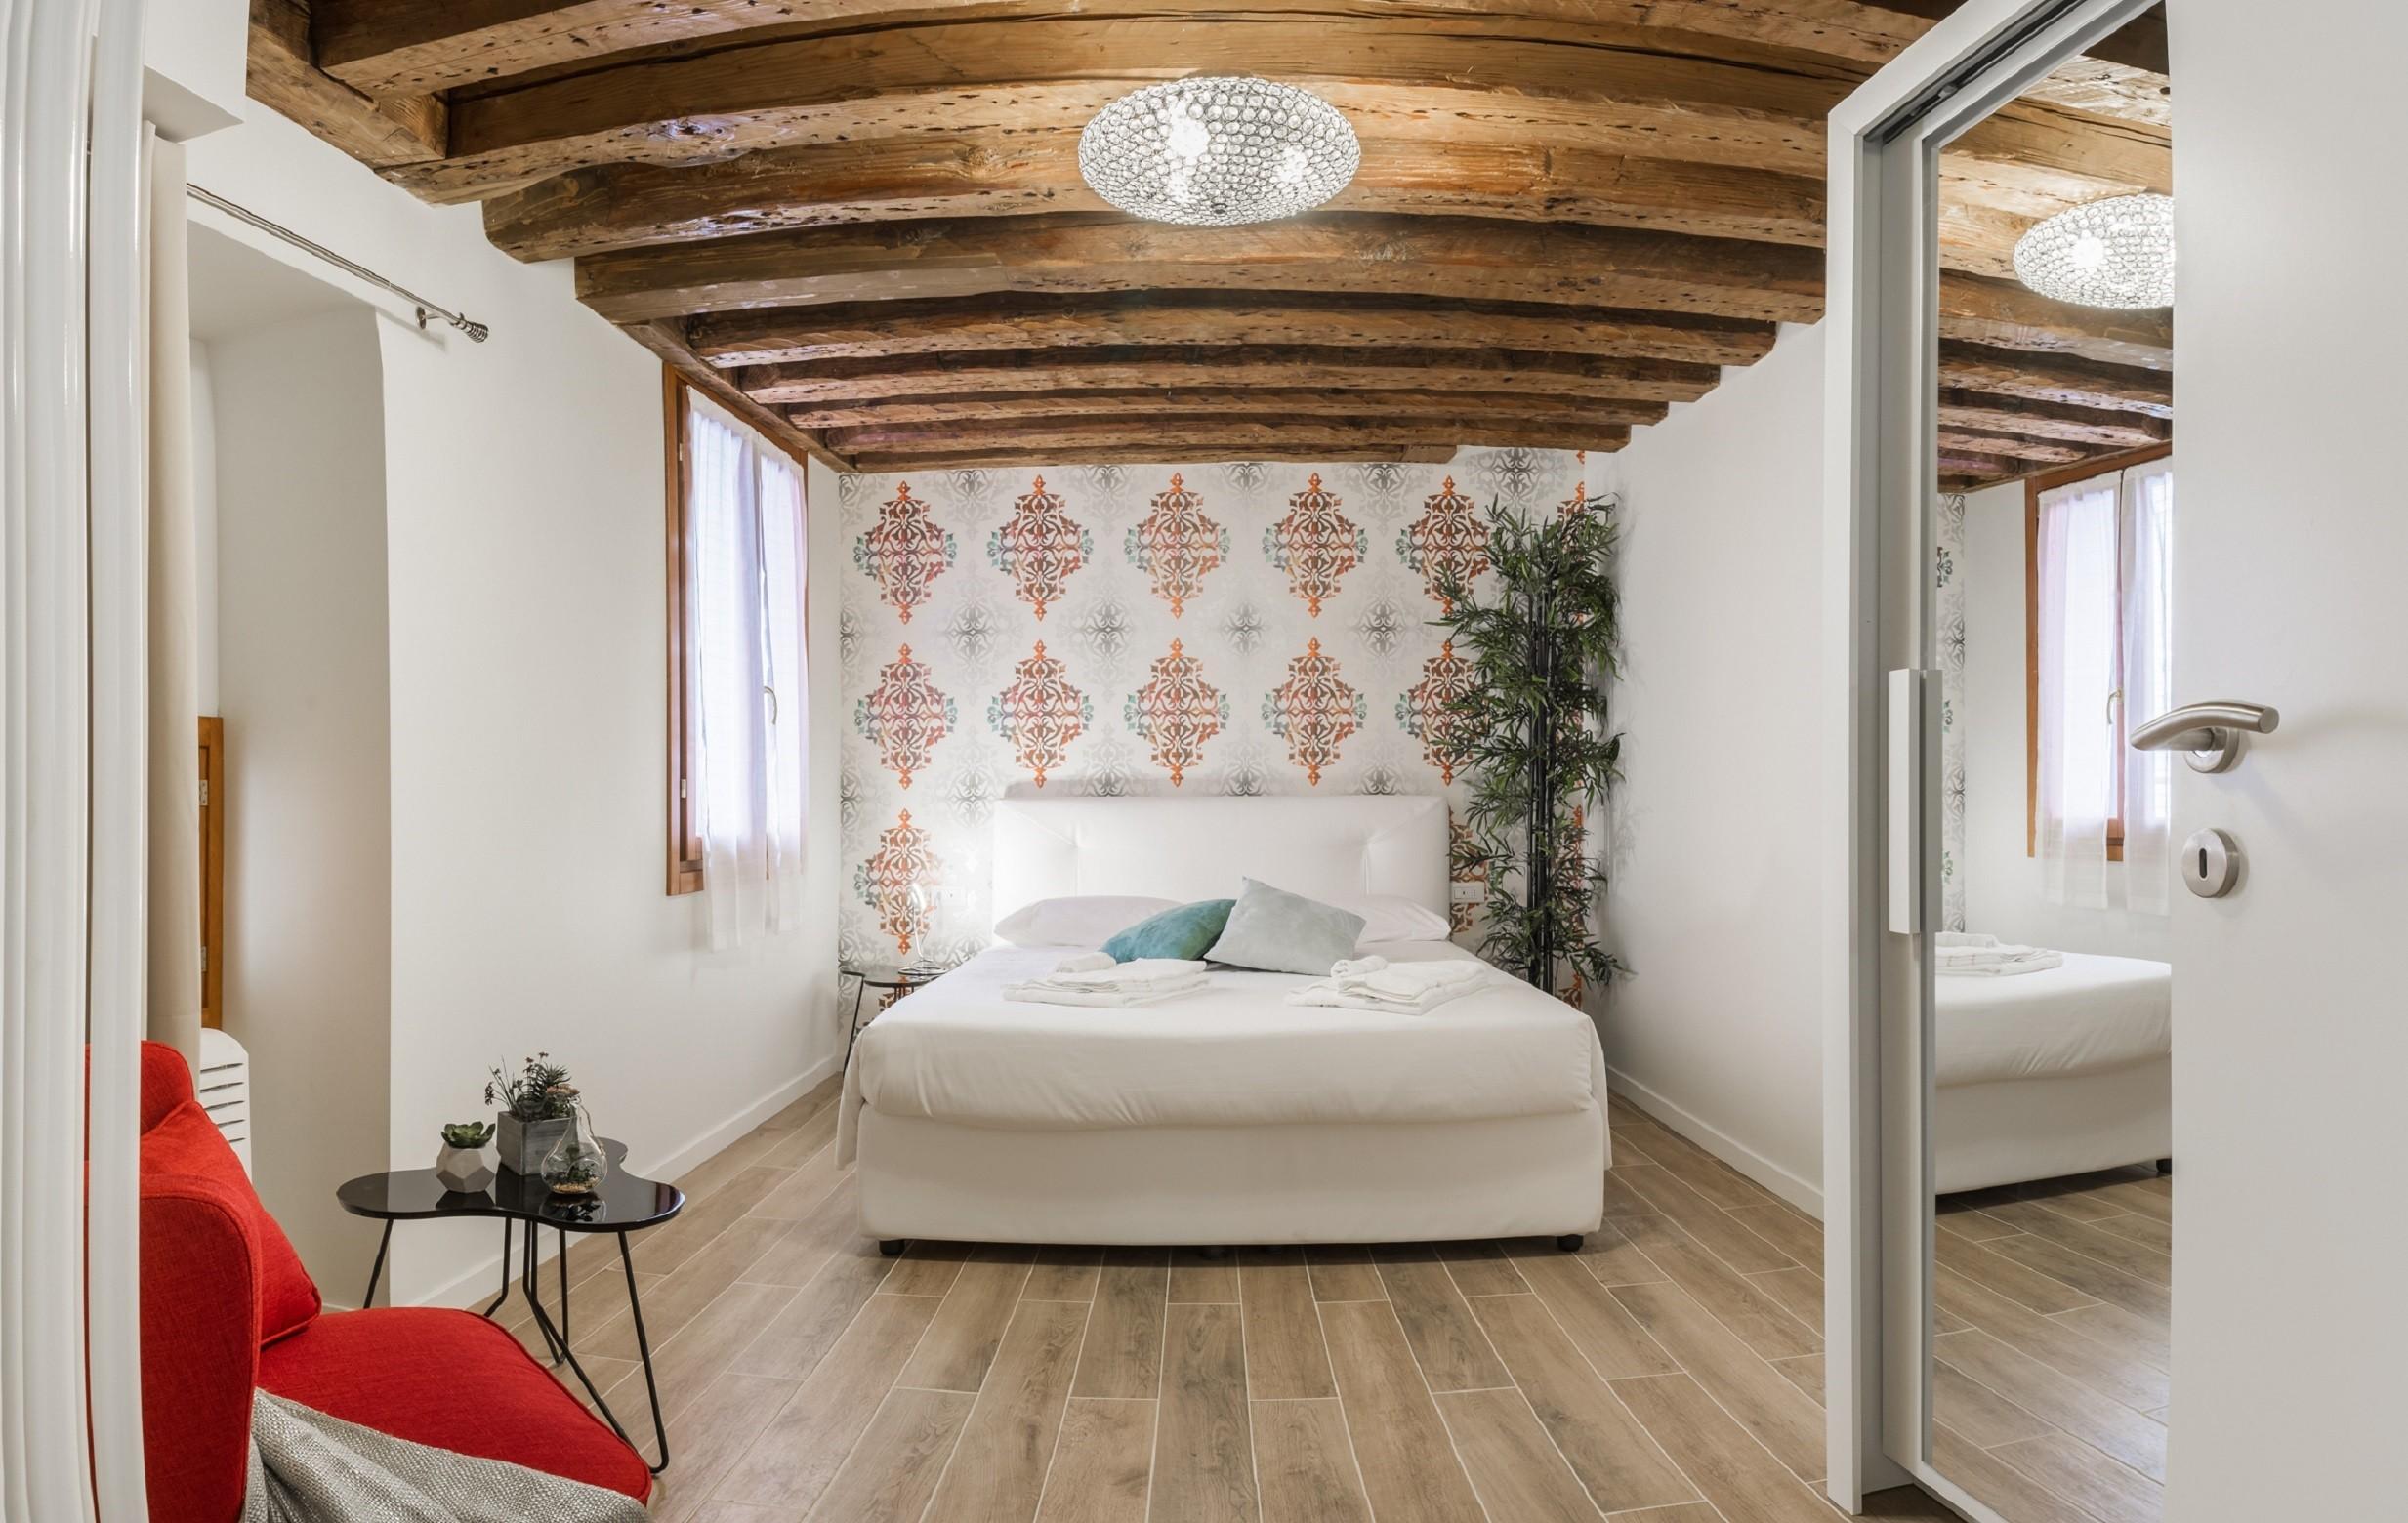 Venice Luxury Palace 4 - Apartments in Venezia